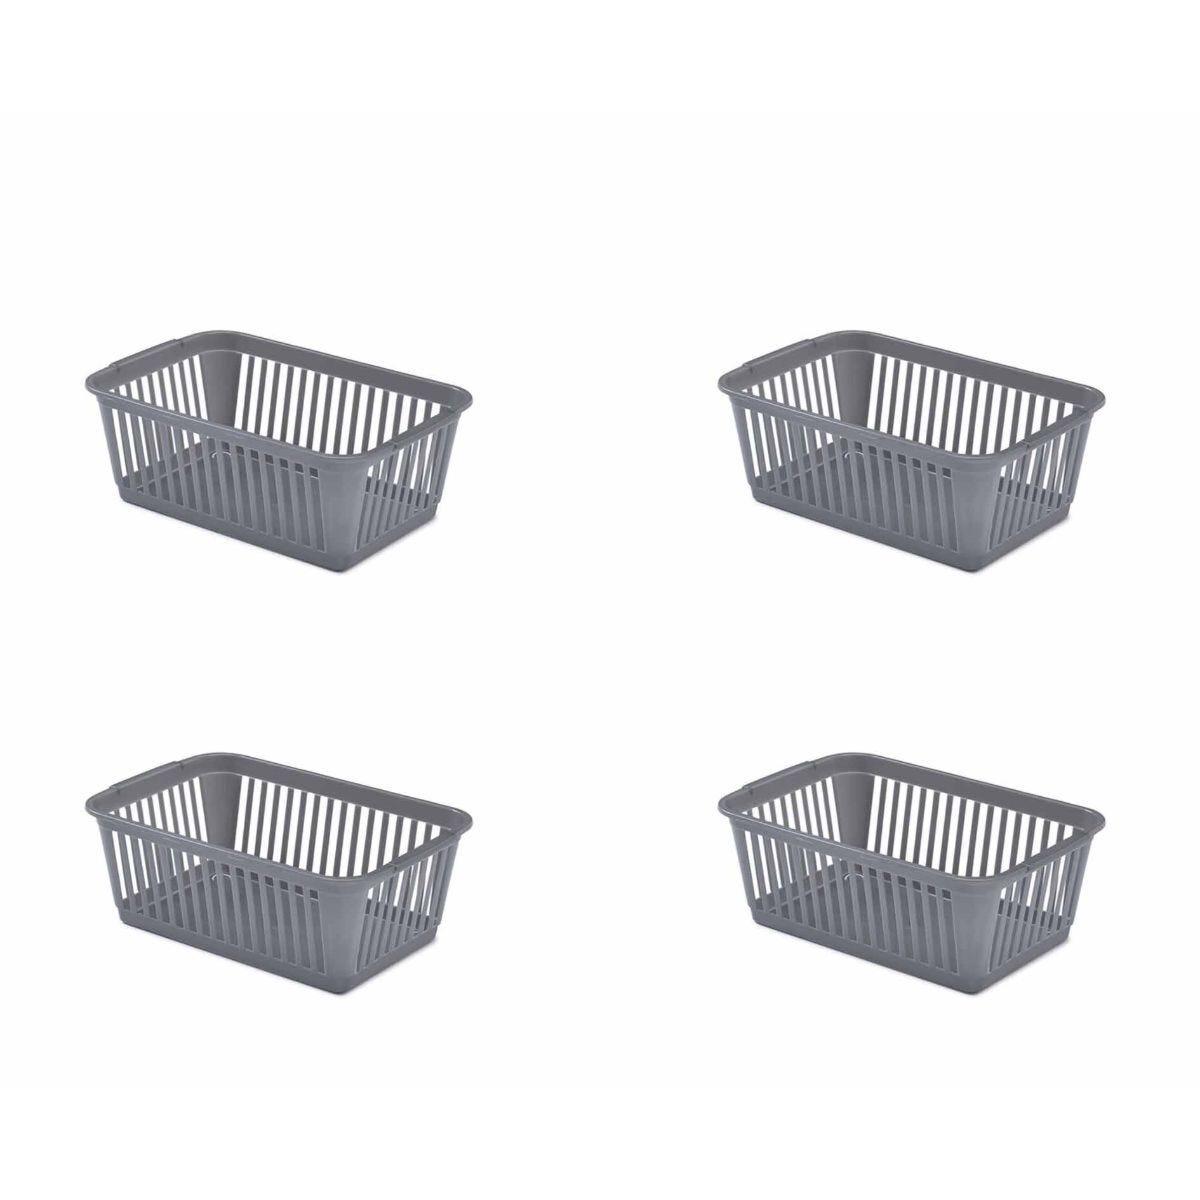 Whitefurze Handy Basket 30cm Pack of 4